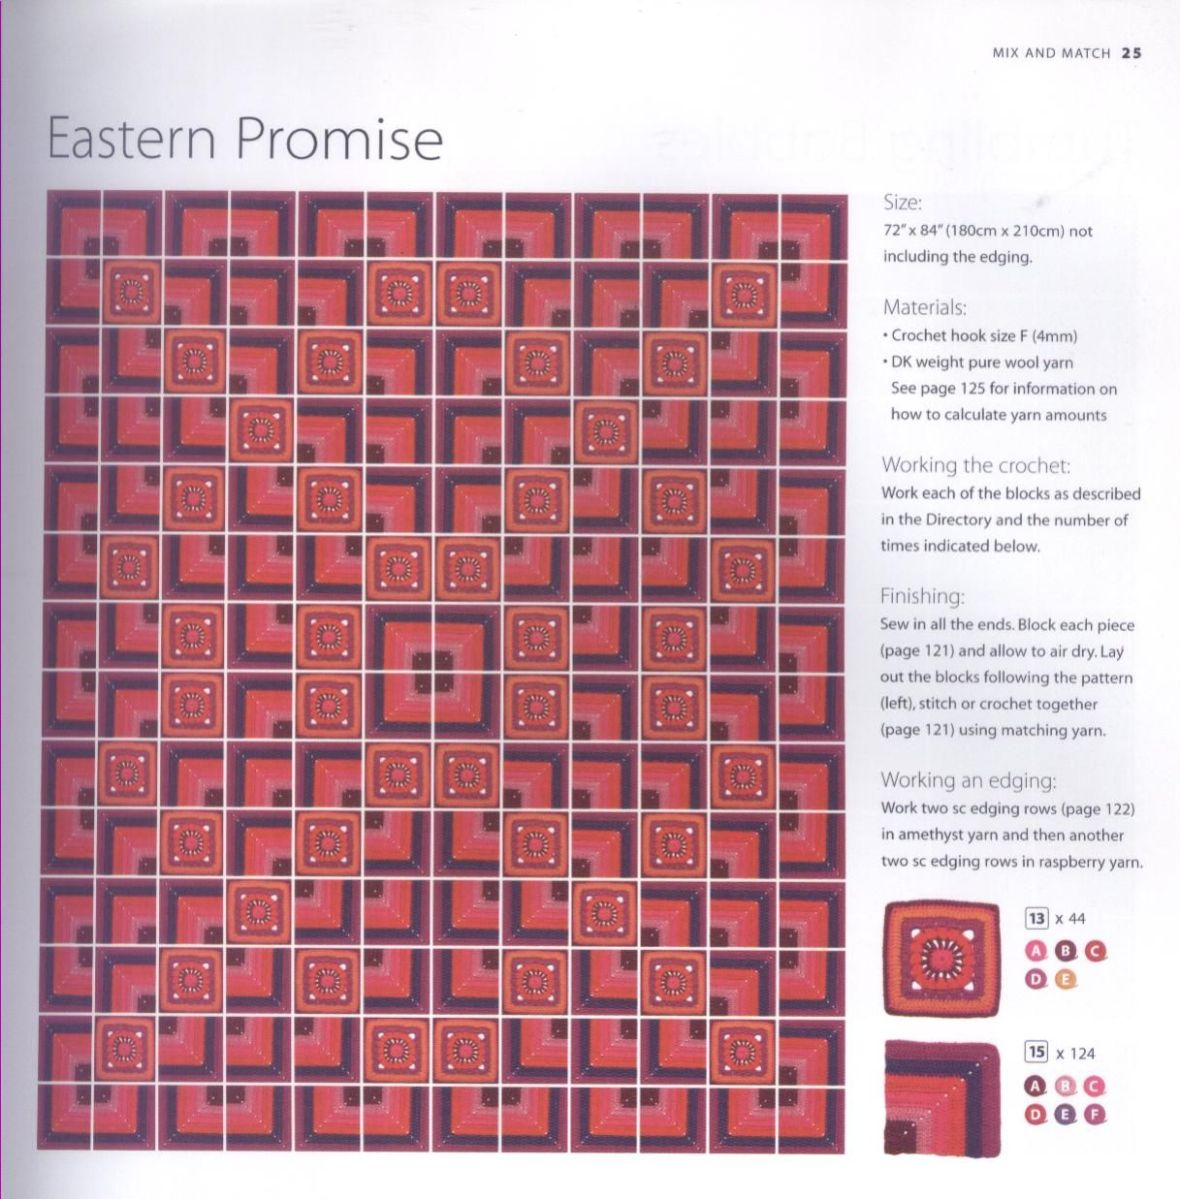 200 Crocheted Blocks for blankets, throws & Afghans 025